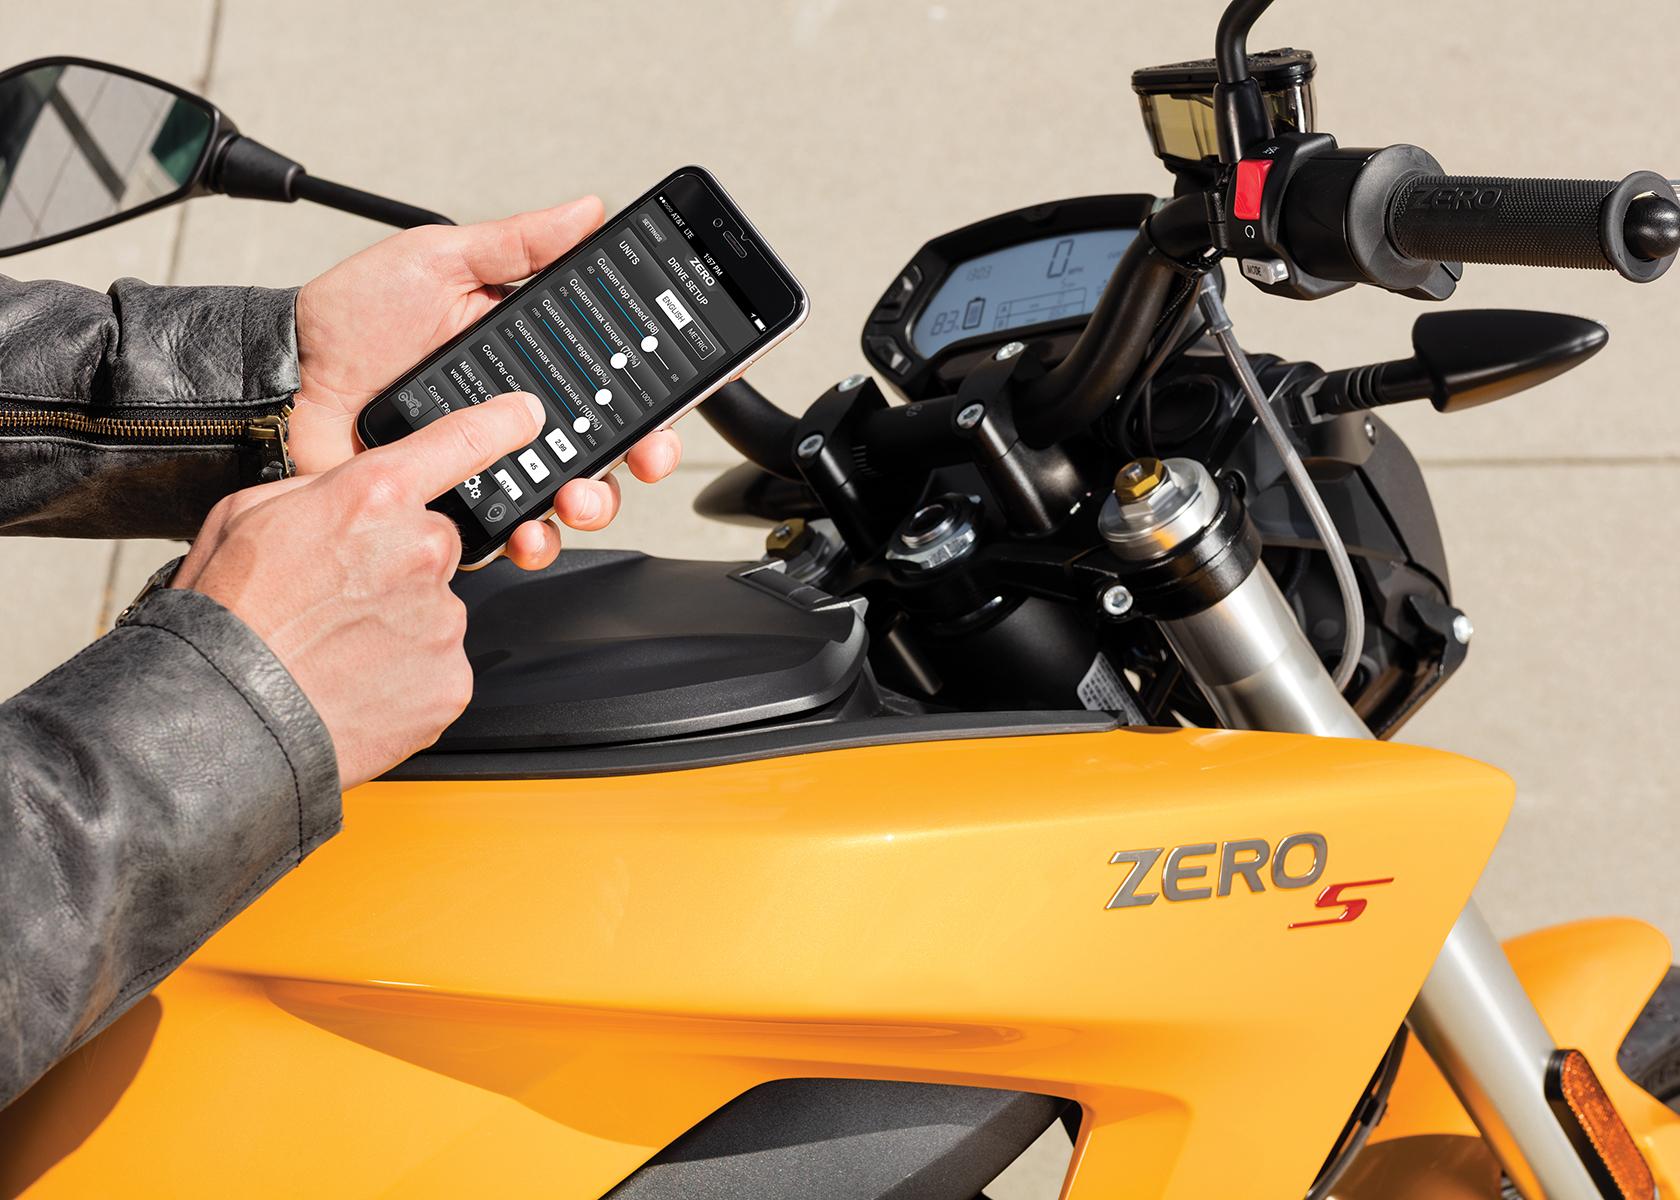 Article 1 US New & Used Zero Motorcycles ATVs Online Sales